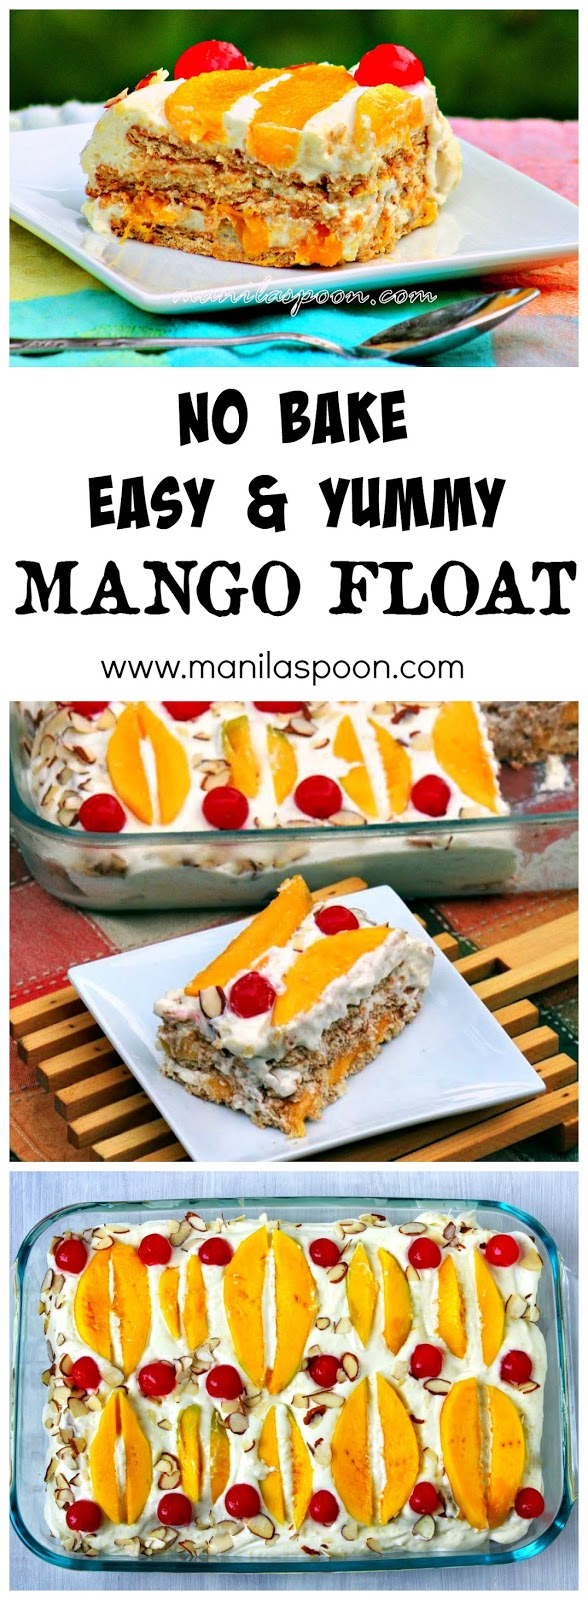 Extra Special Mango Float Manila Spoon How To Cut